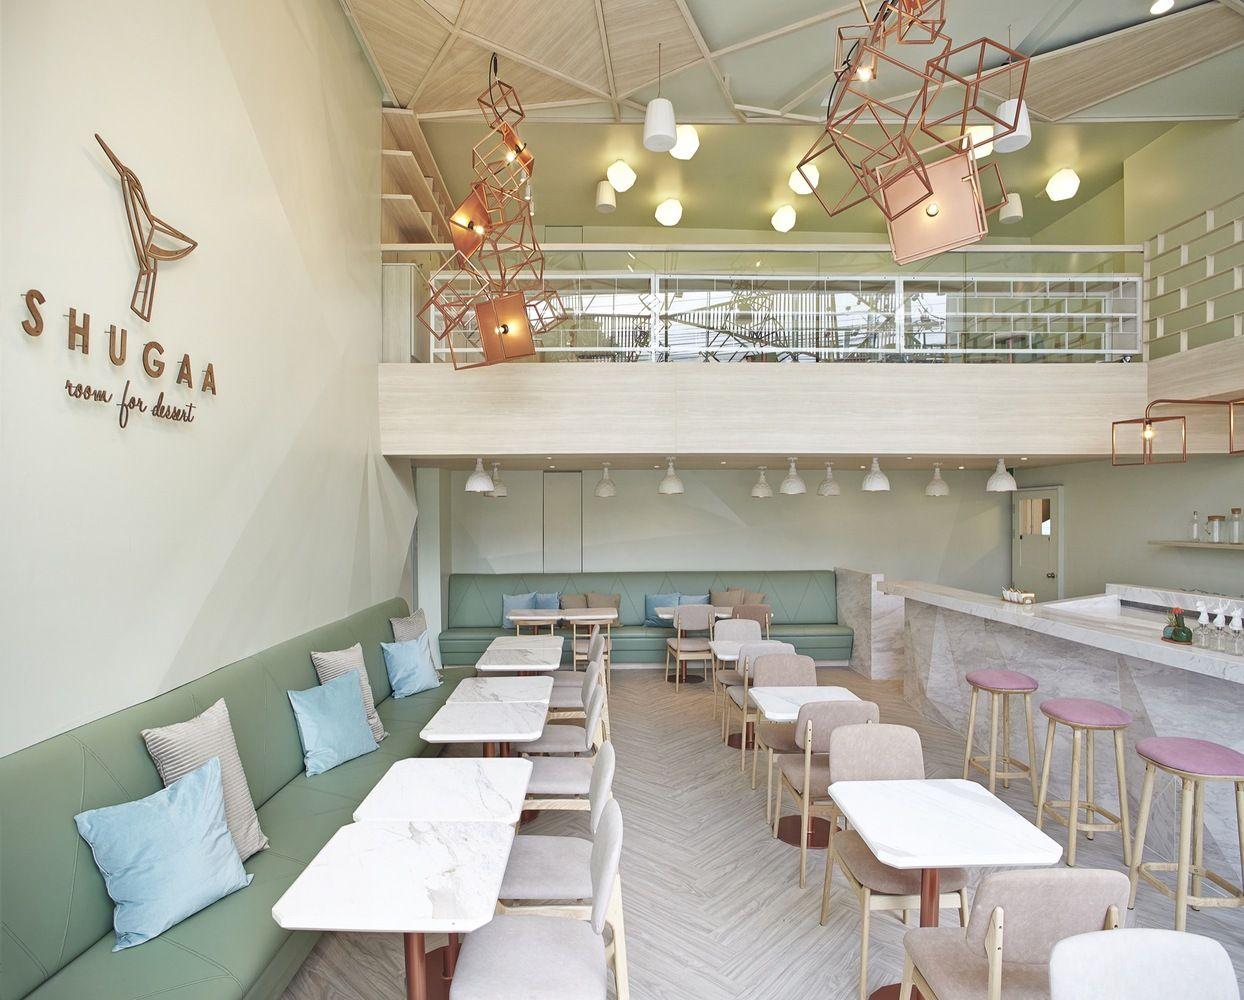 bar interiors design 2. Gallery Of SHUGAA / Party/space/design - 2 Bar Interiors Design 0